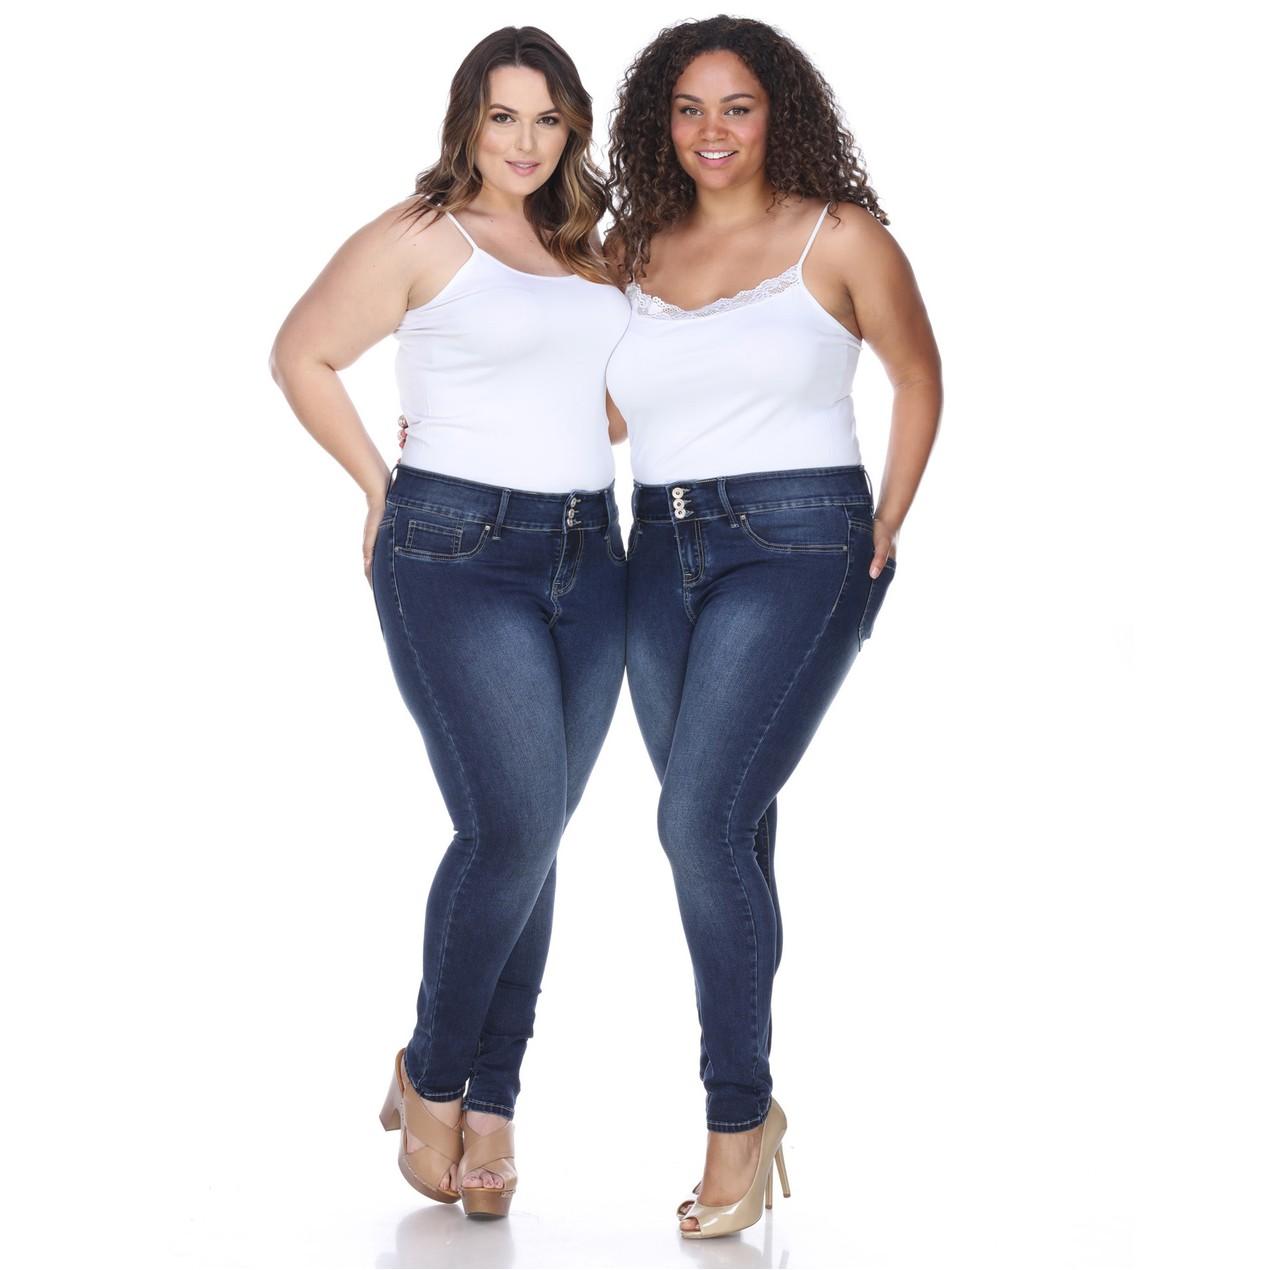 2d5c1c7dd0 White Mark Women s Plus Size Super Stretch Denim Jeans - Tanga